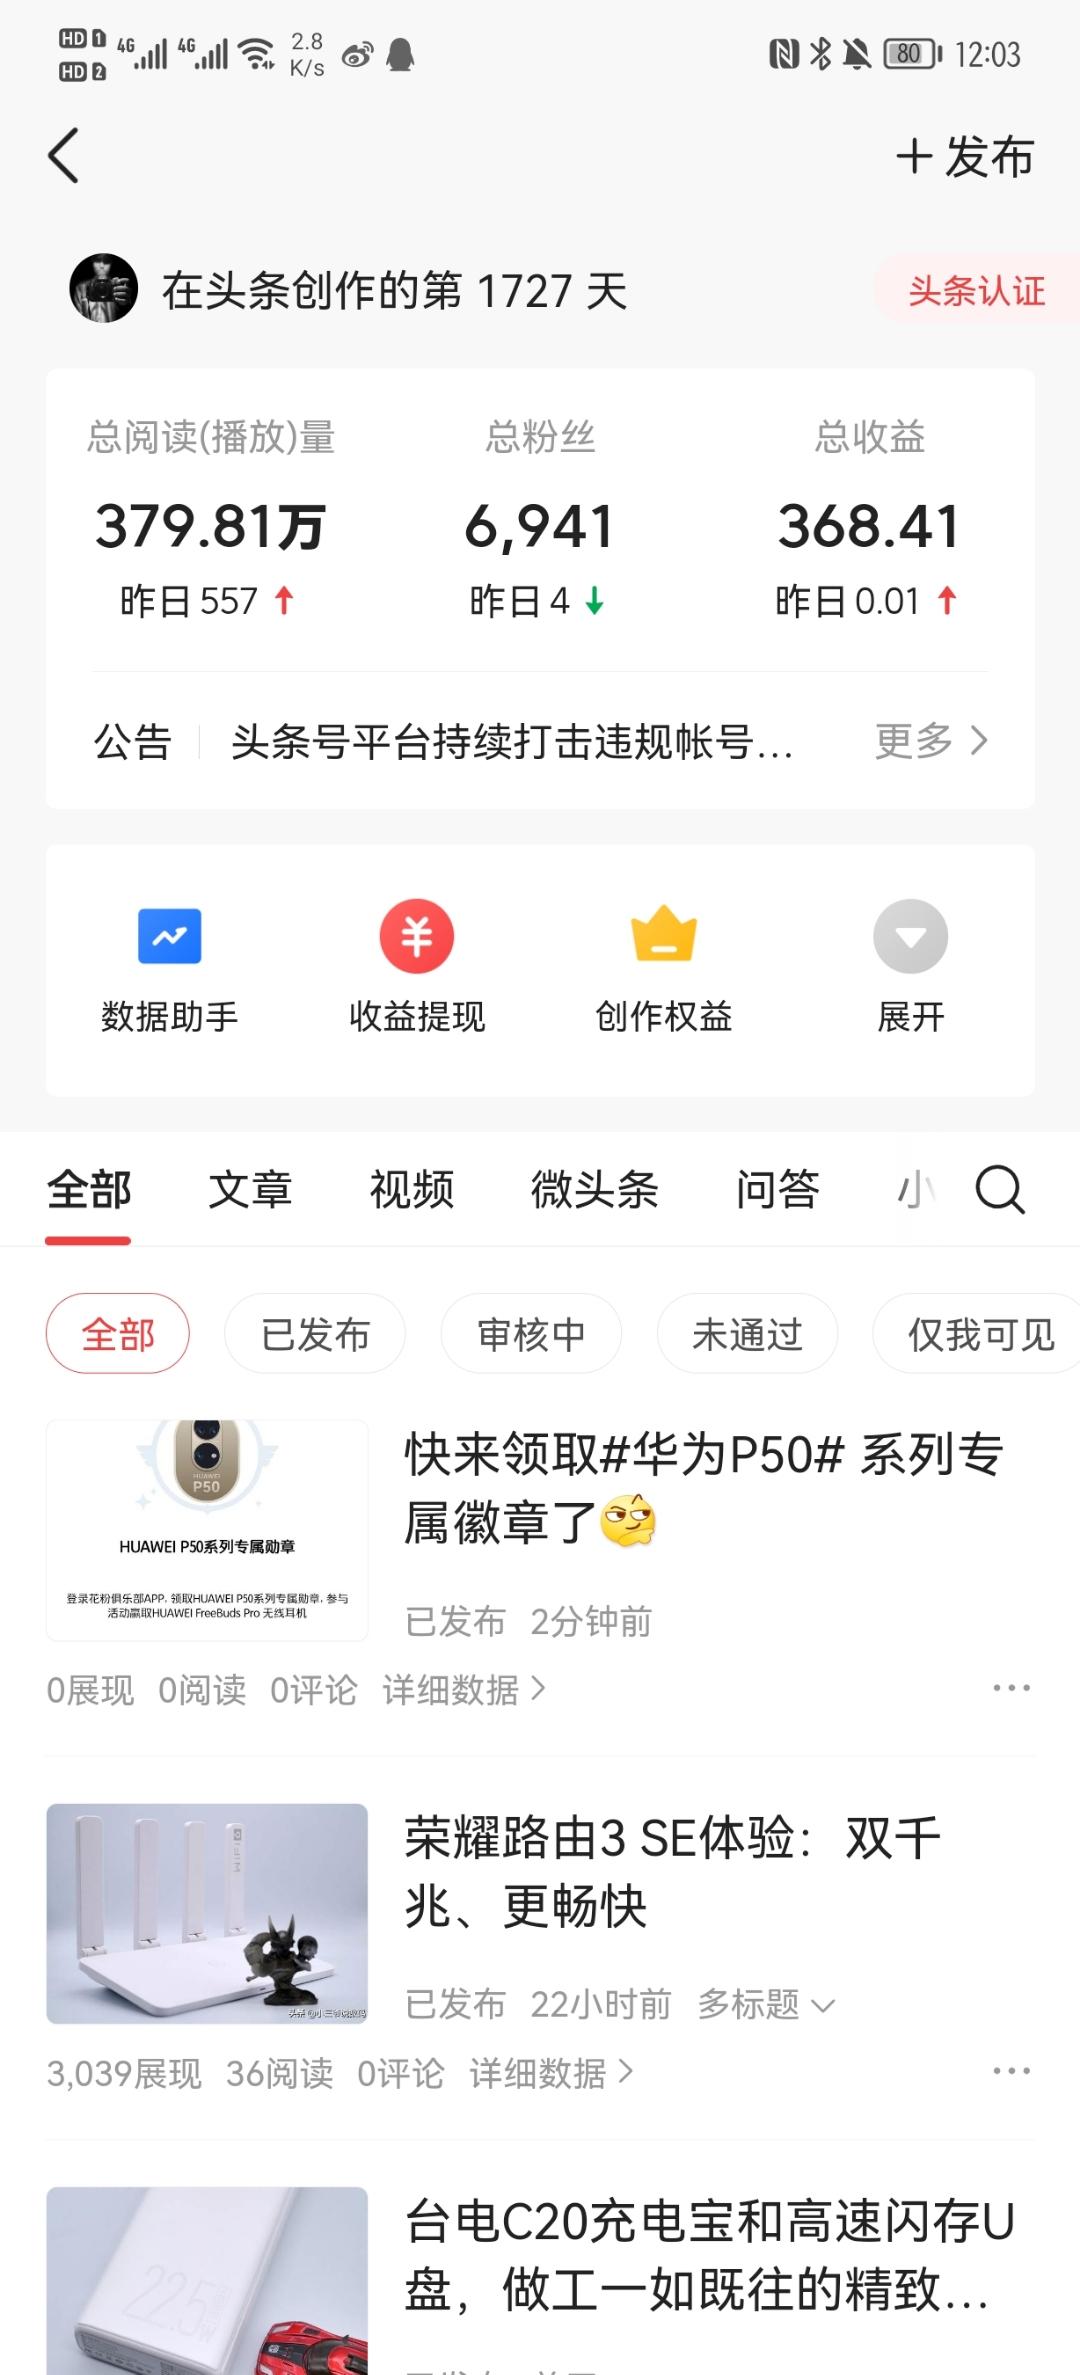 Screenshot_20210823_120319_com.ss.android.article.news.jpg